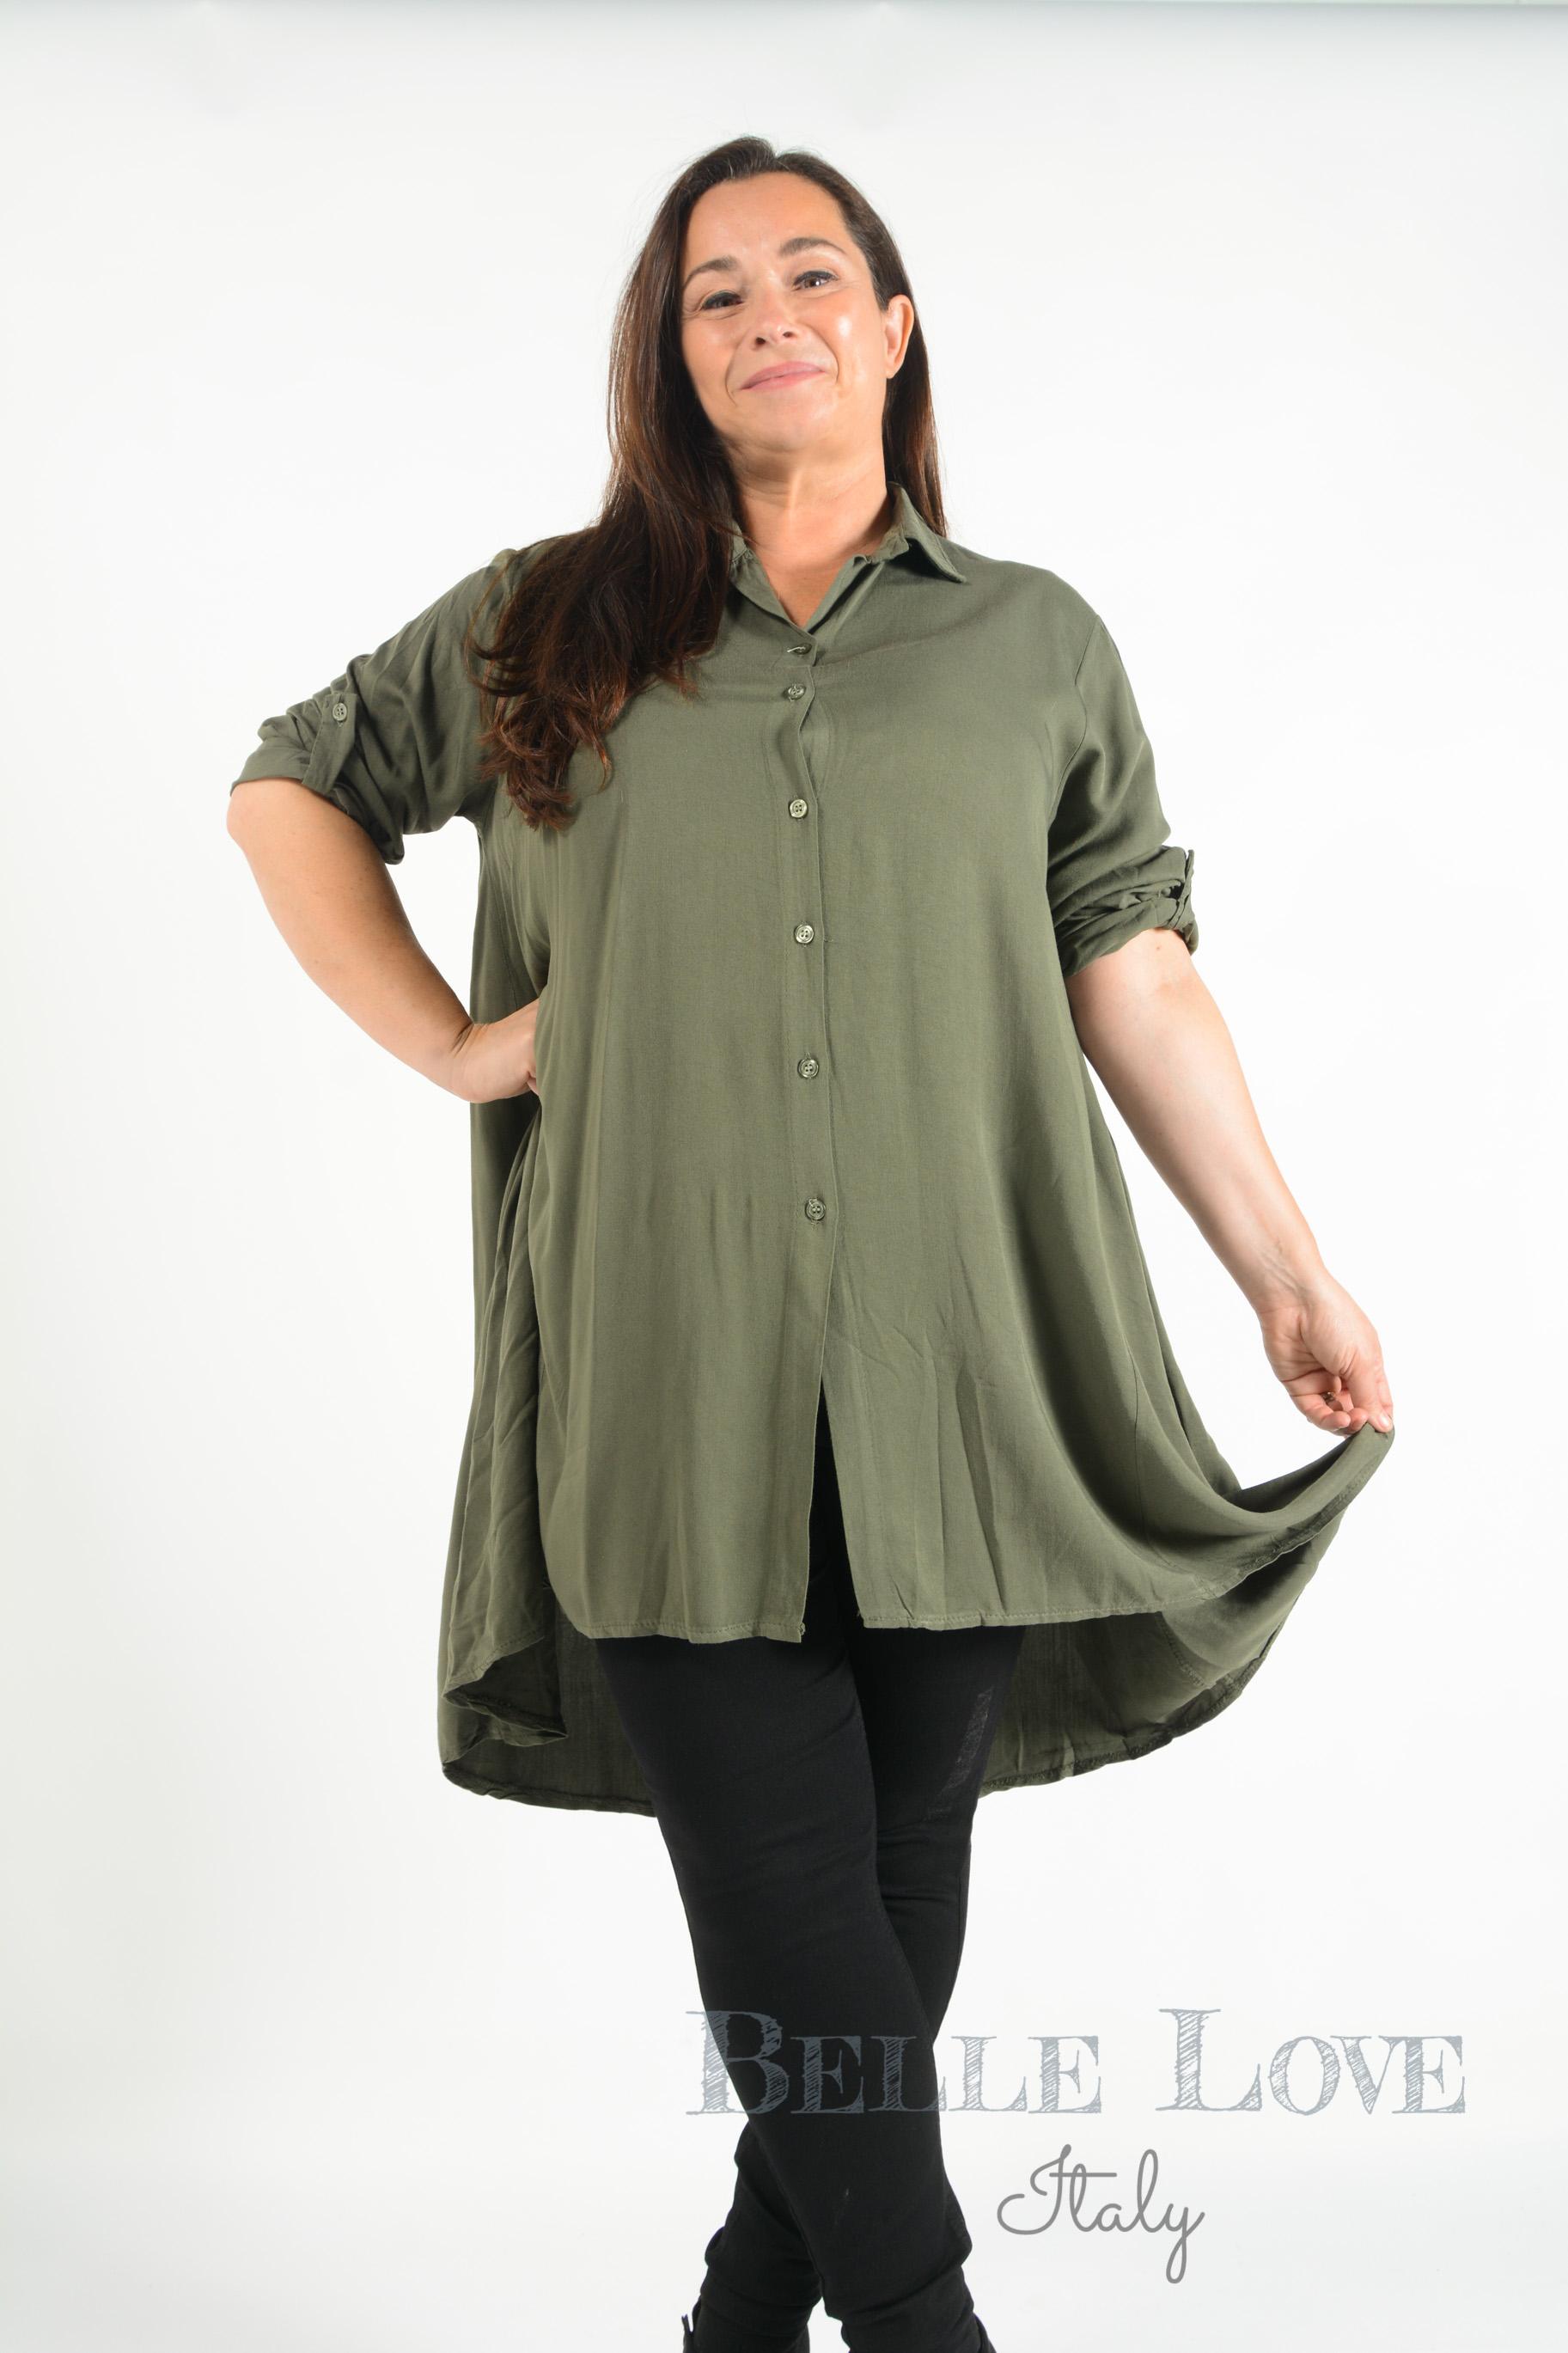 Belle Love Italy Heidi Shirt Dress